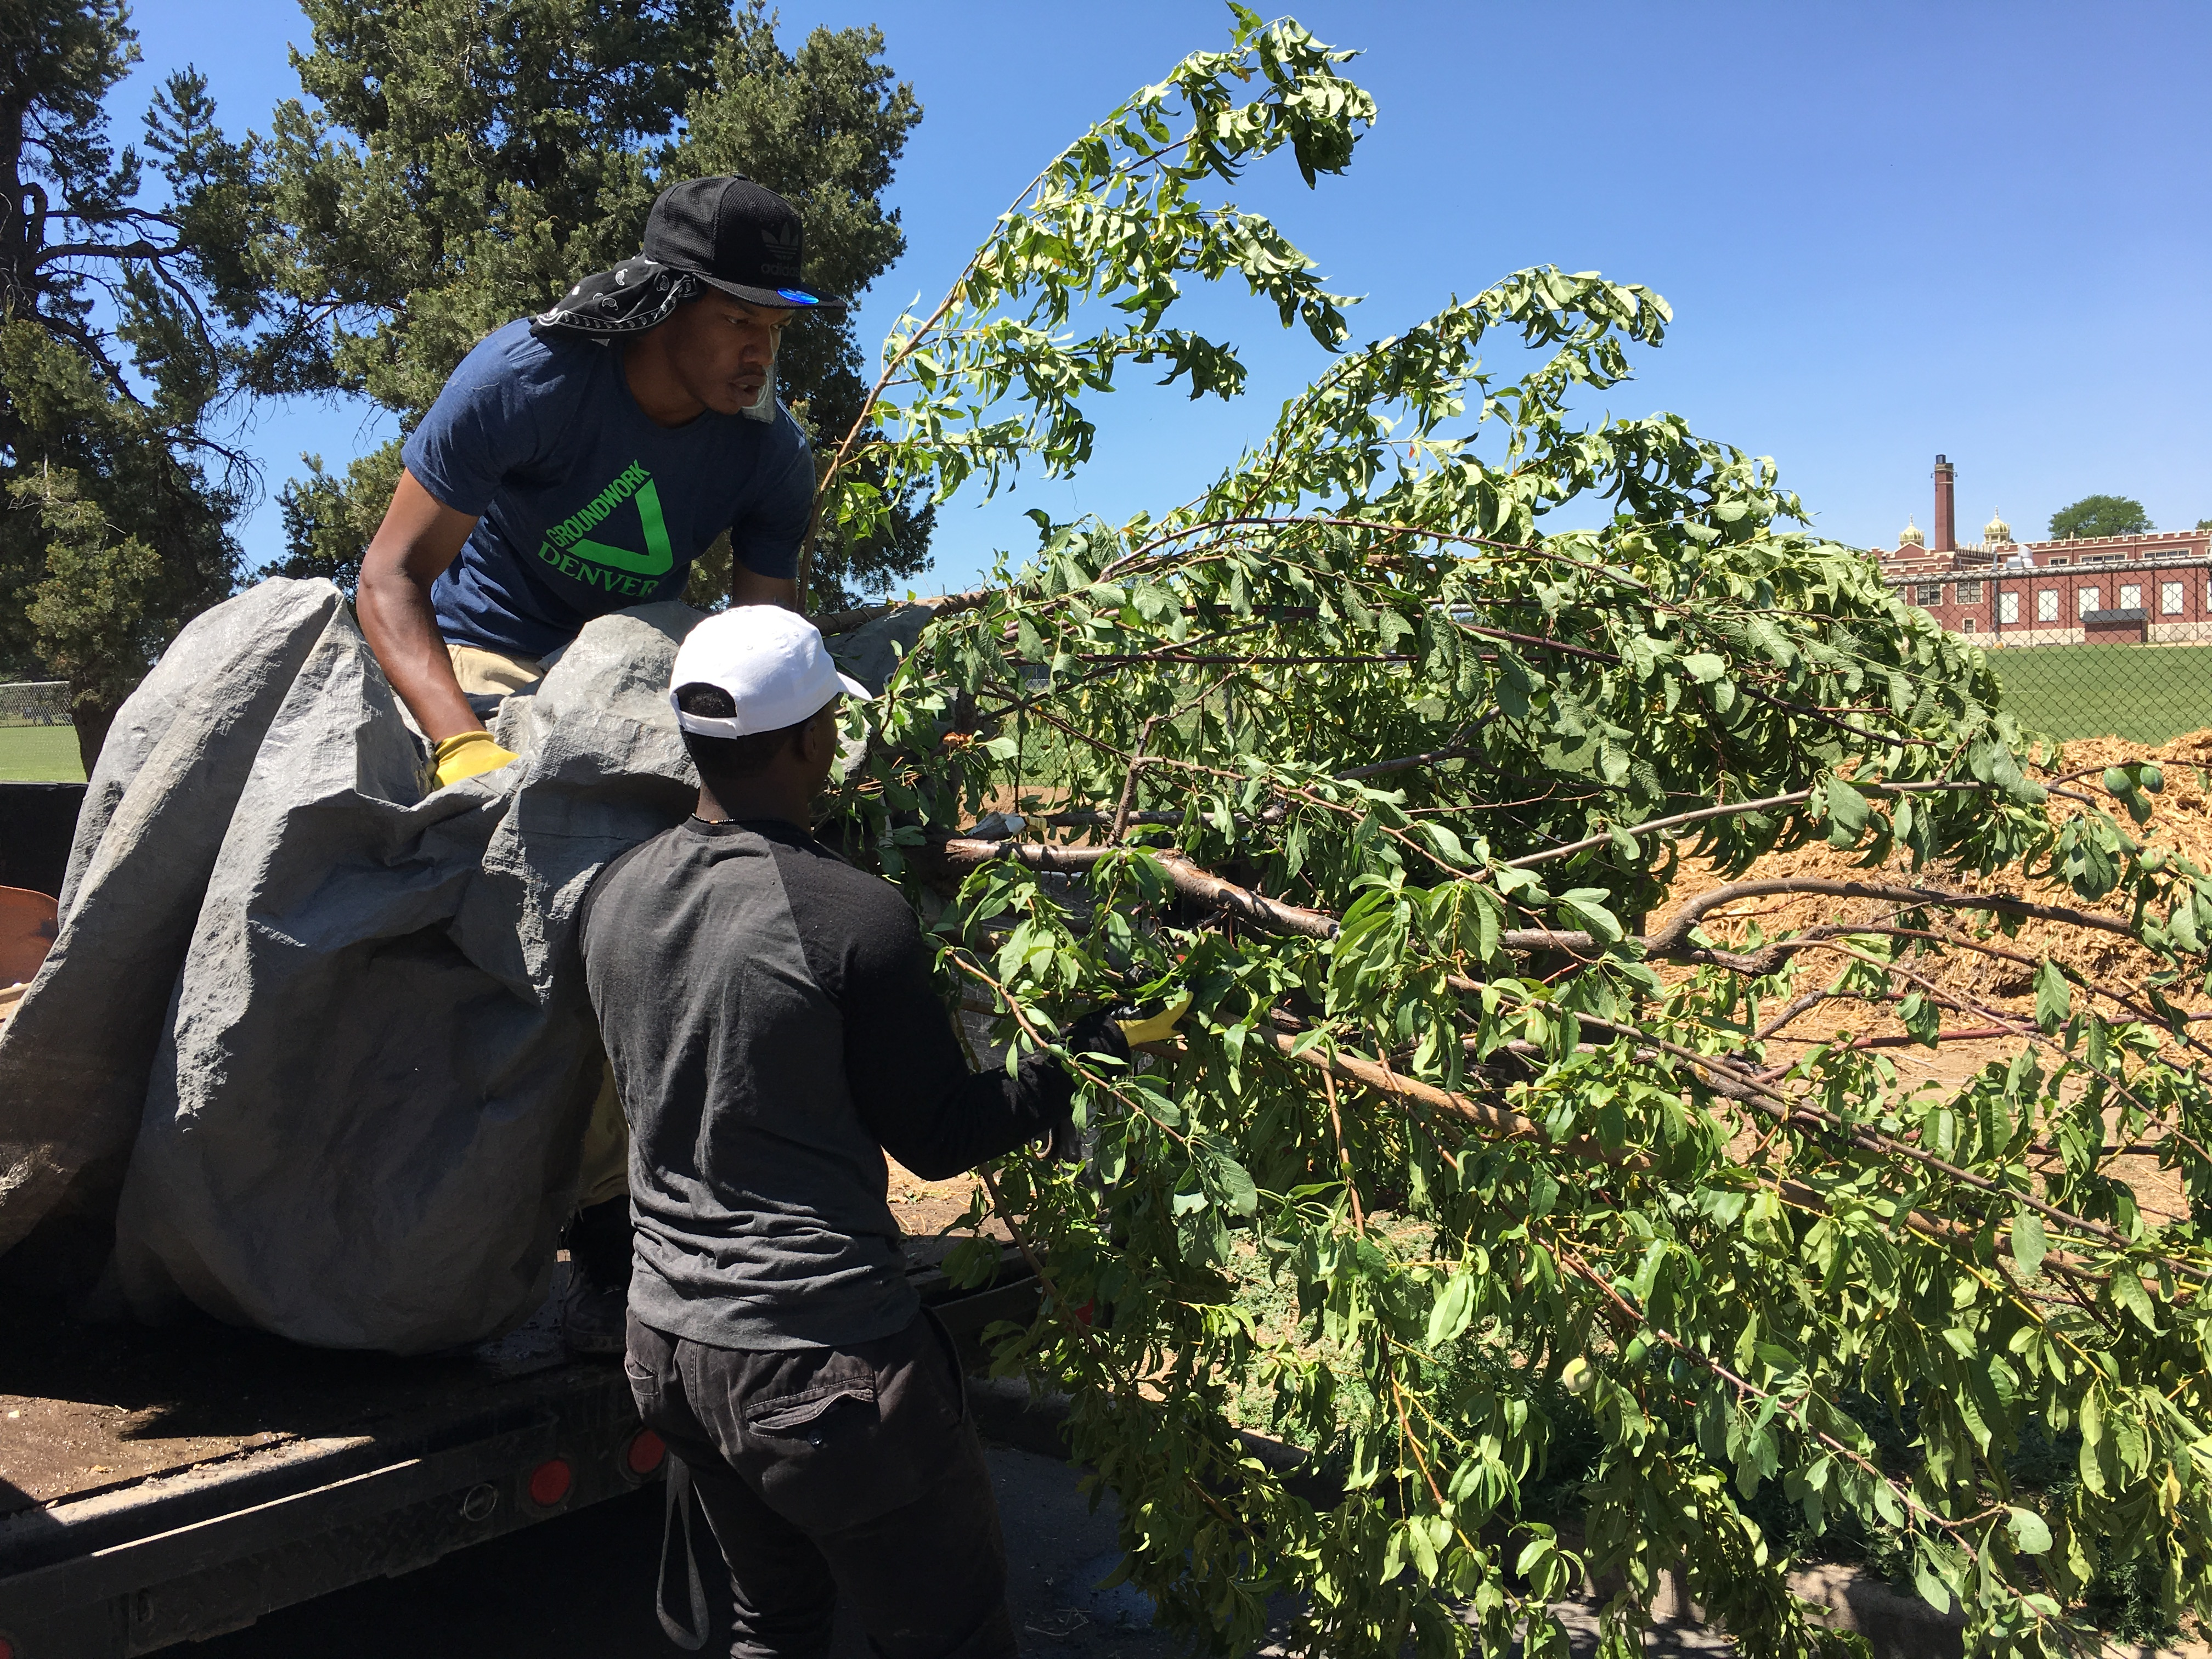 Jai_tree-planting-denver